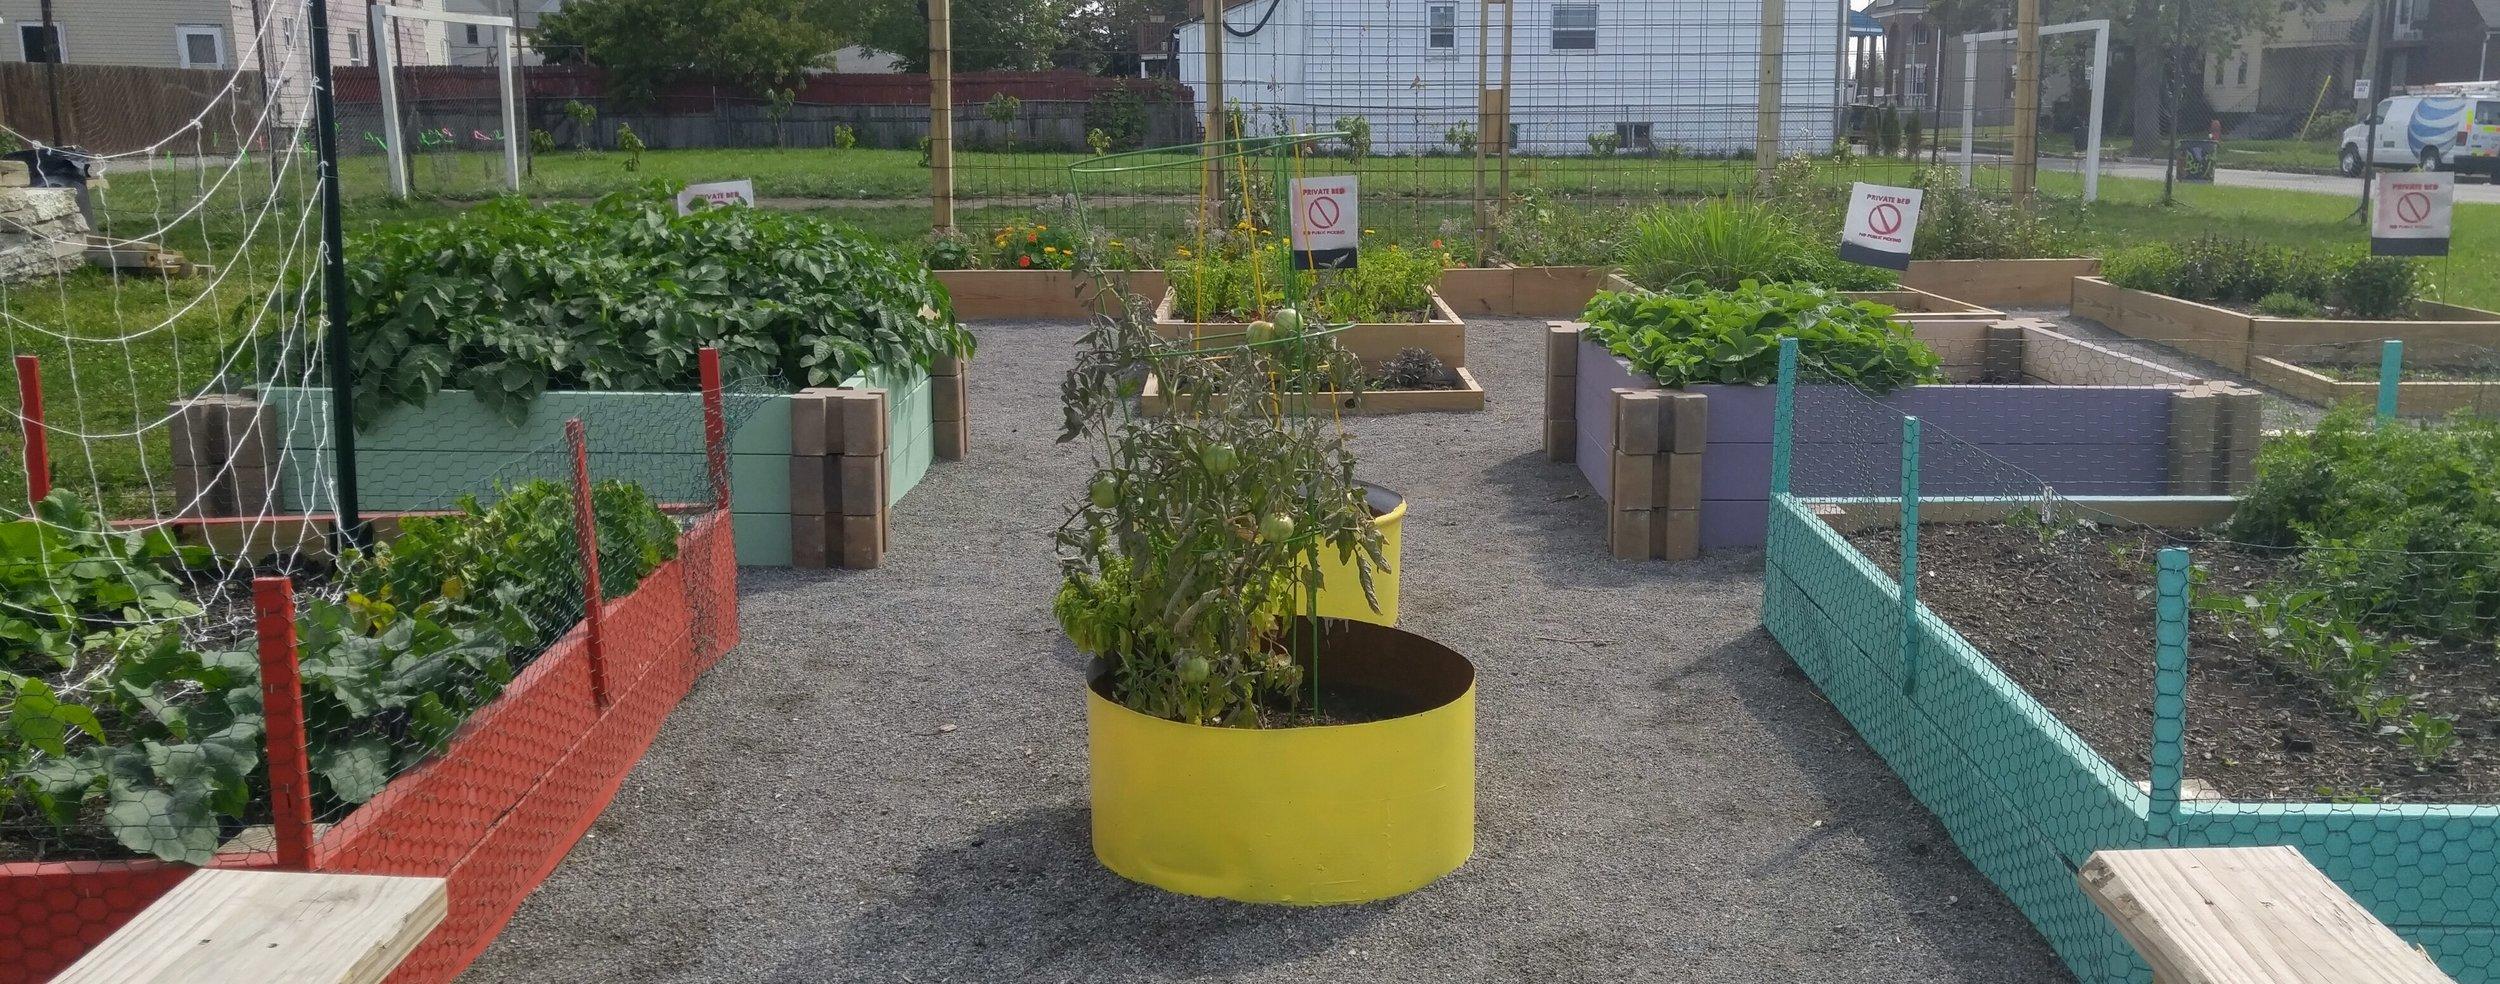 Building Bridges - Multicultural Children's Community Garden